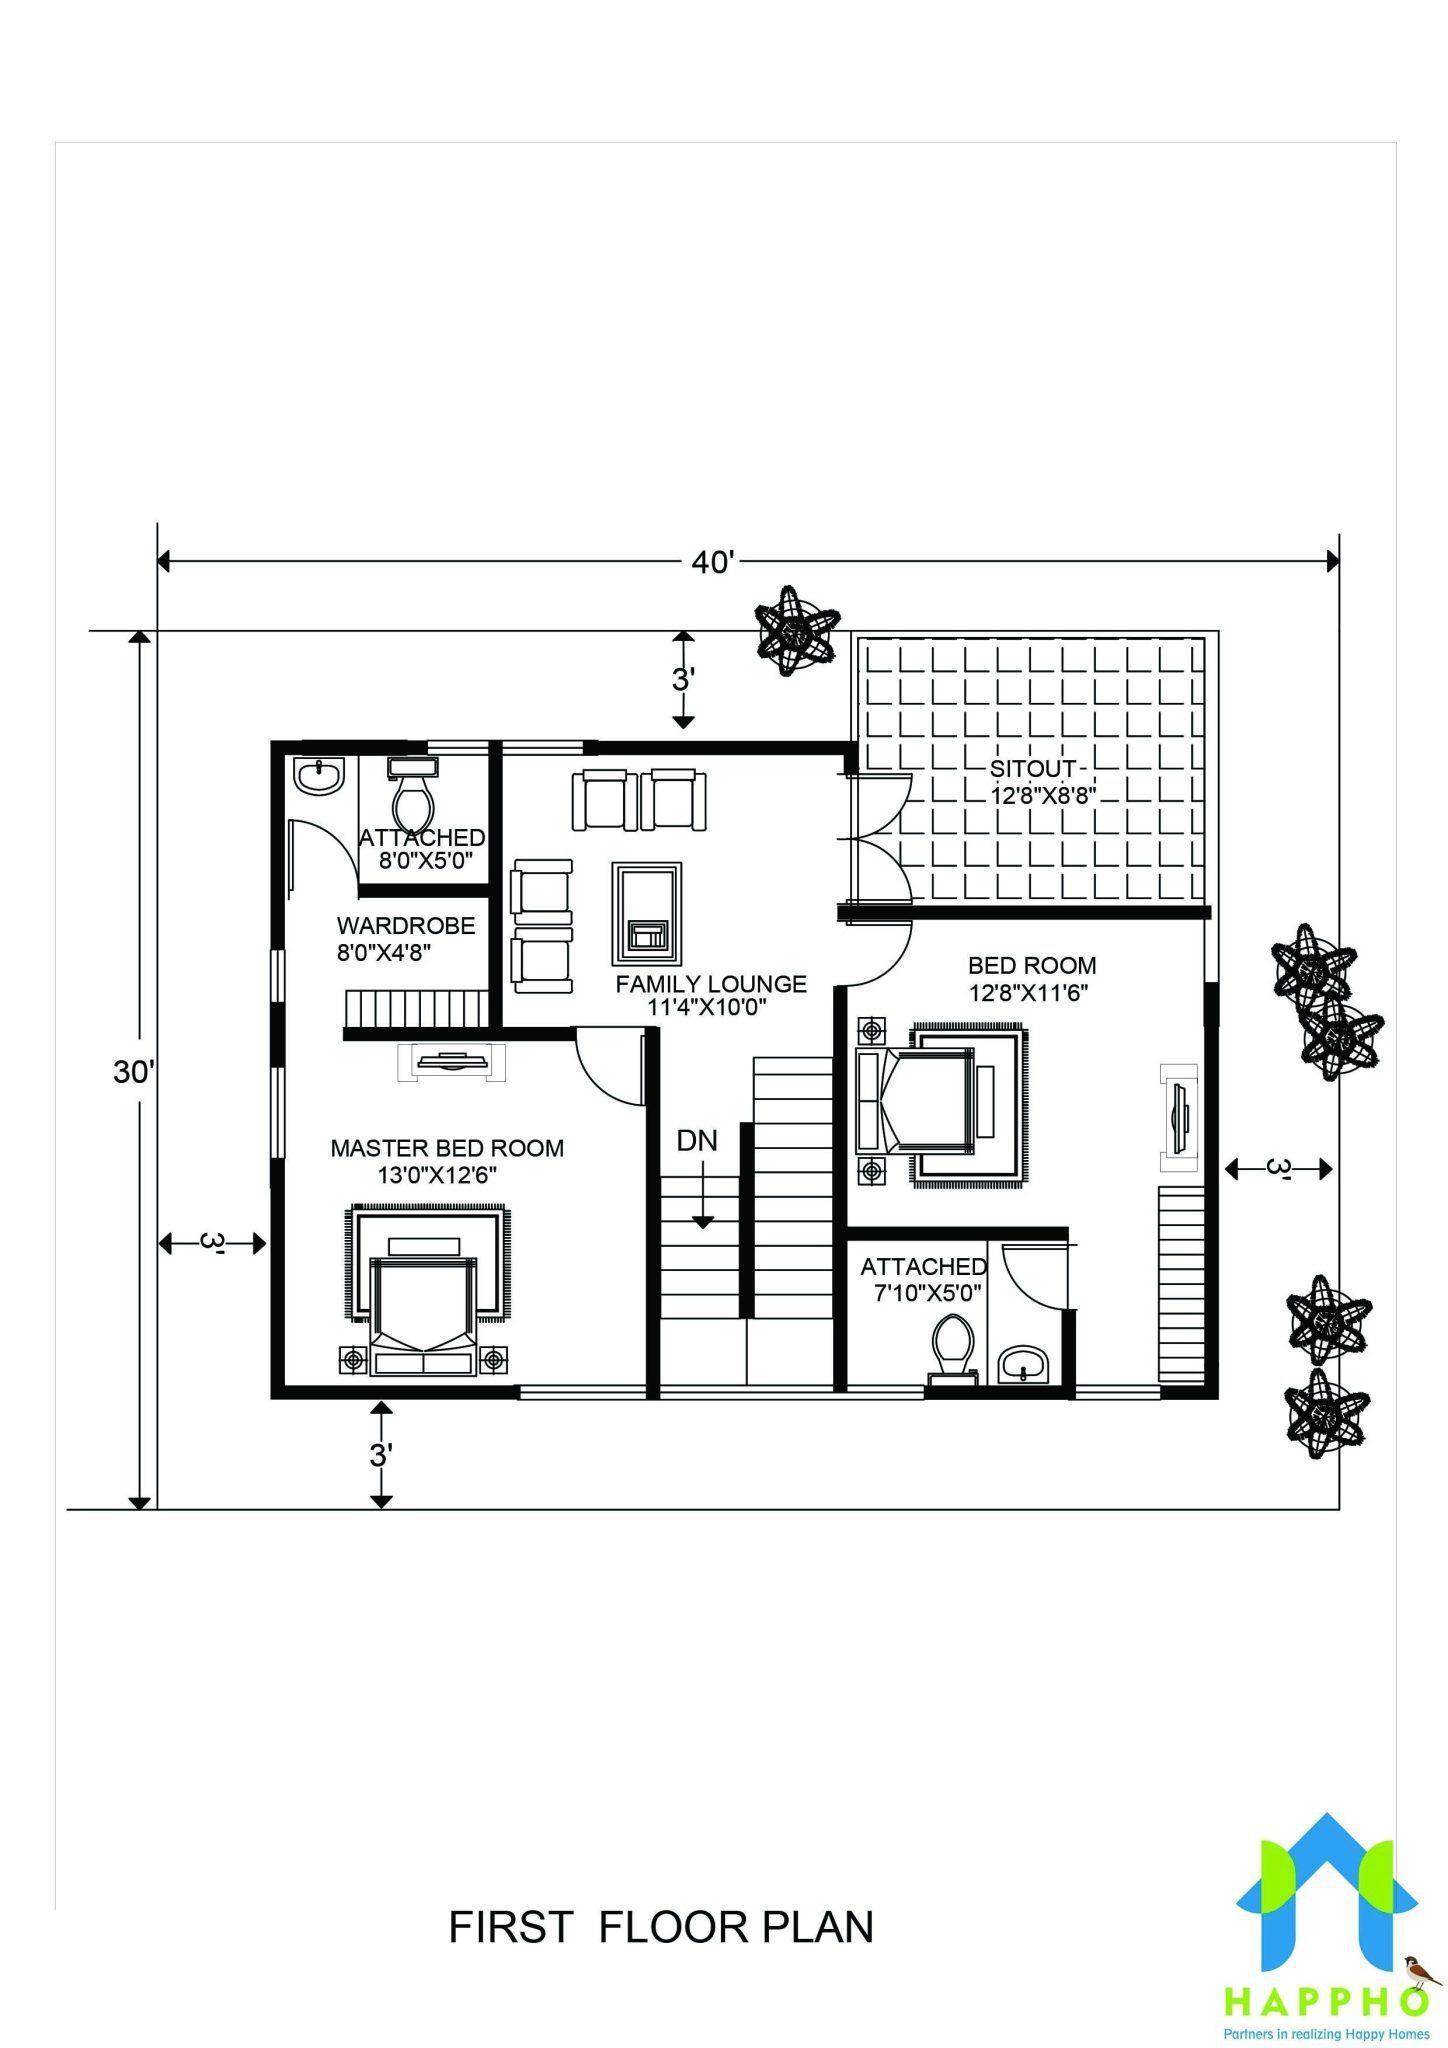 1-BHK Floor Plan for 20 x 40 Feet plot (800 Square Feet)